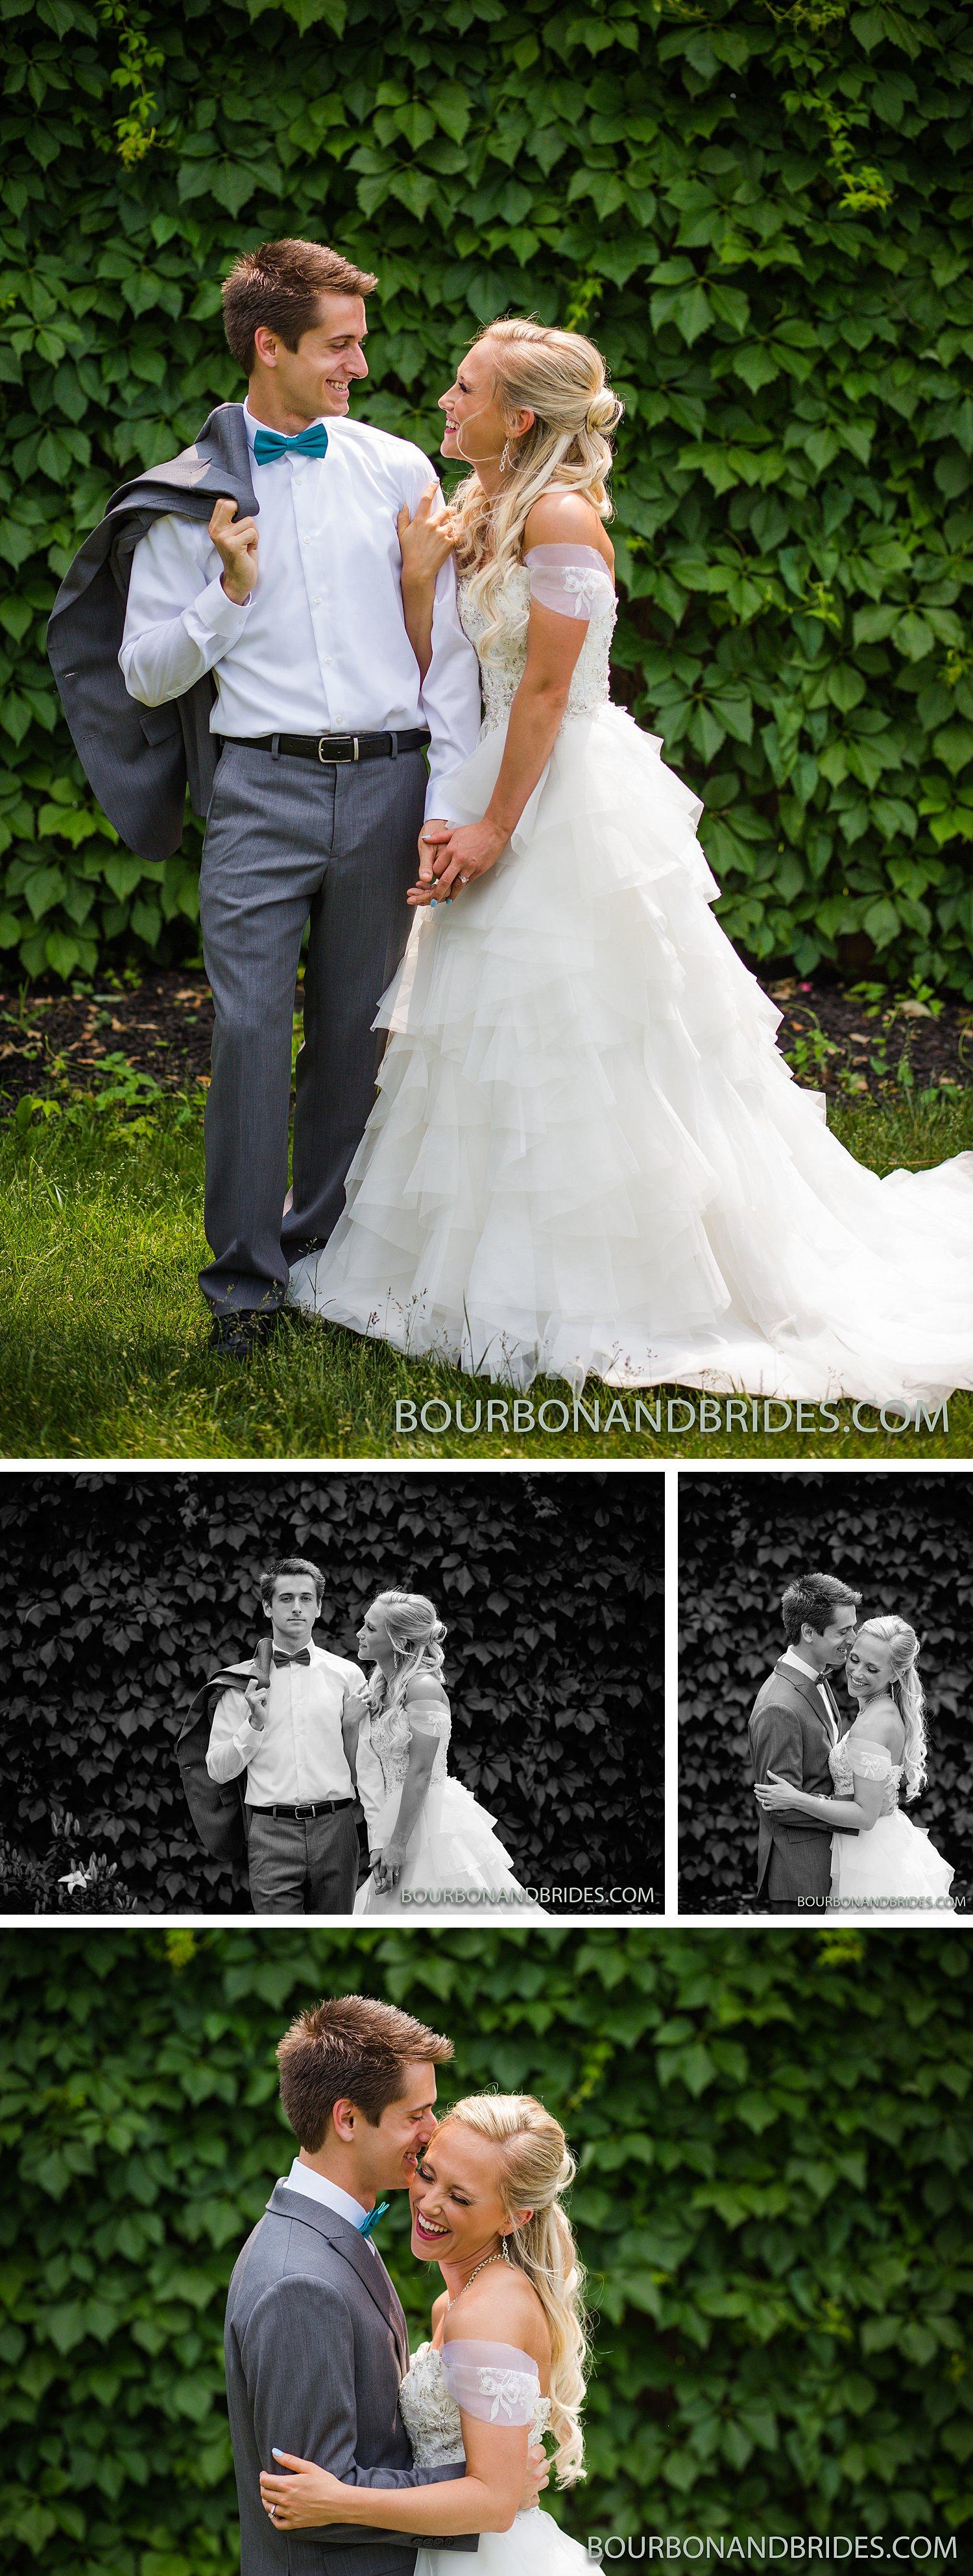 Lexington-Kentucky-wedding-Grand-Reserve_bride-groom.jpg